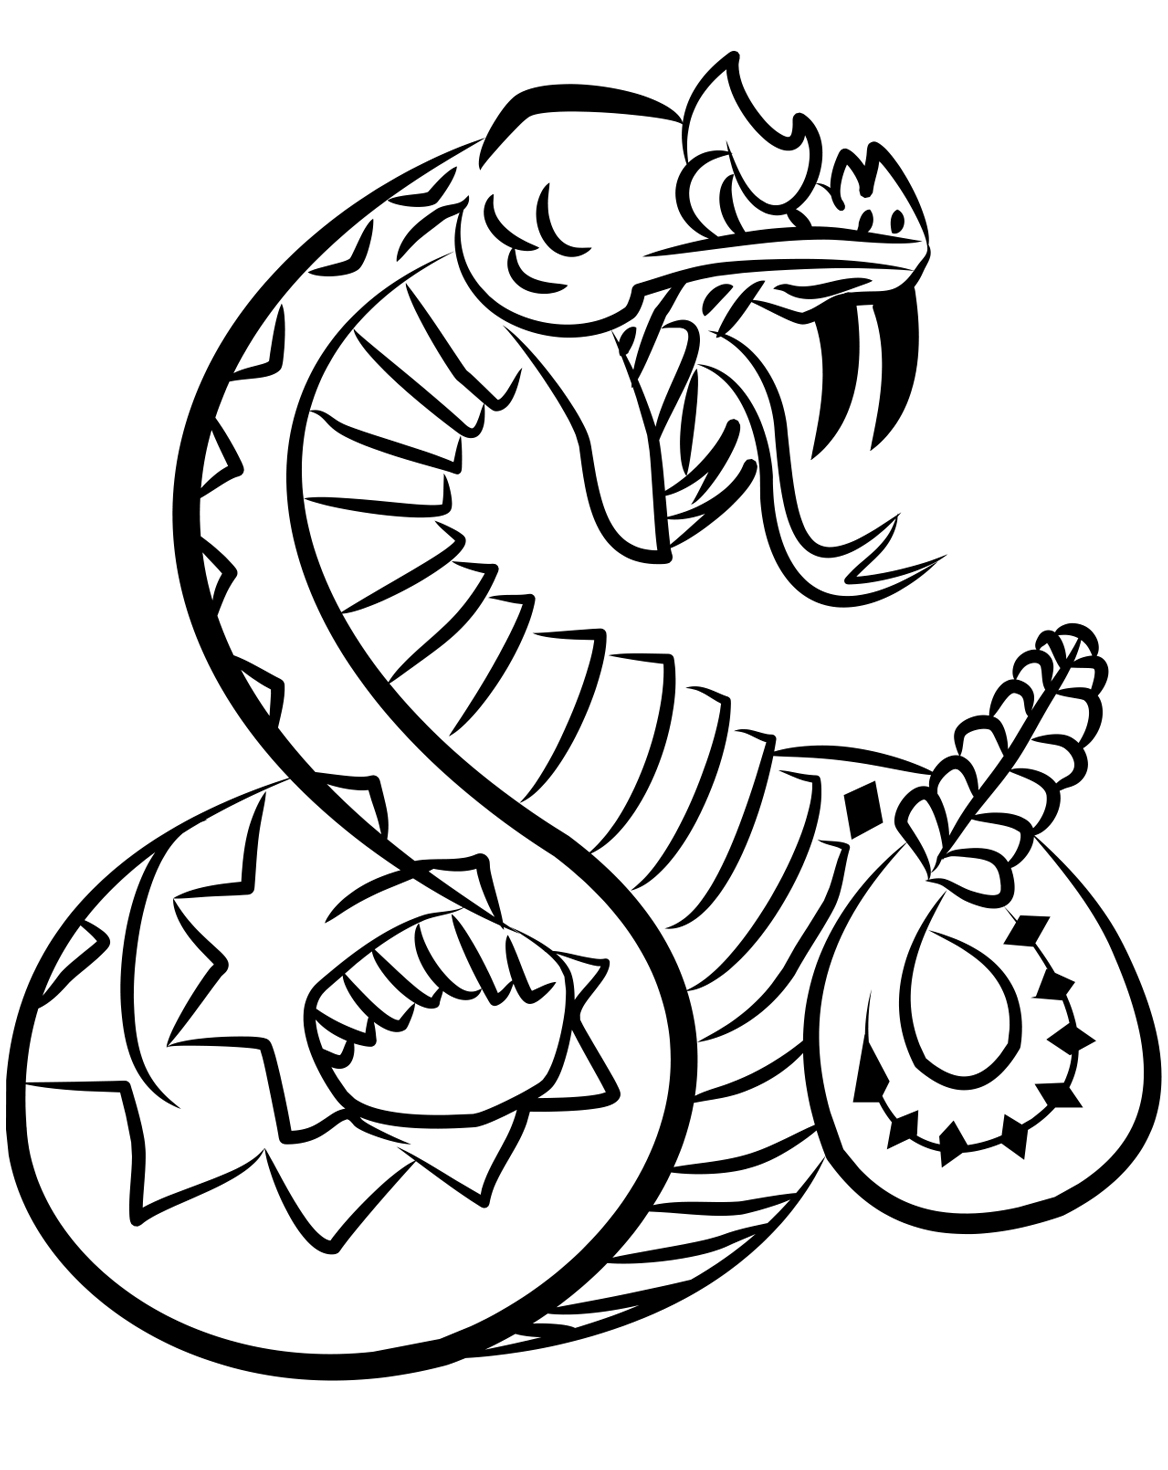 Diamondback clipart clip art transparent download Free Rattlesnakes Cliparts, Download Free Clip Art, Free Clip Art on ... clip art transparent download